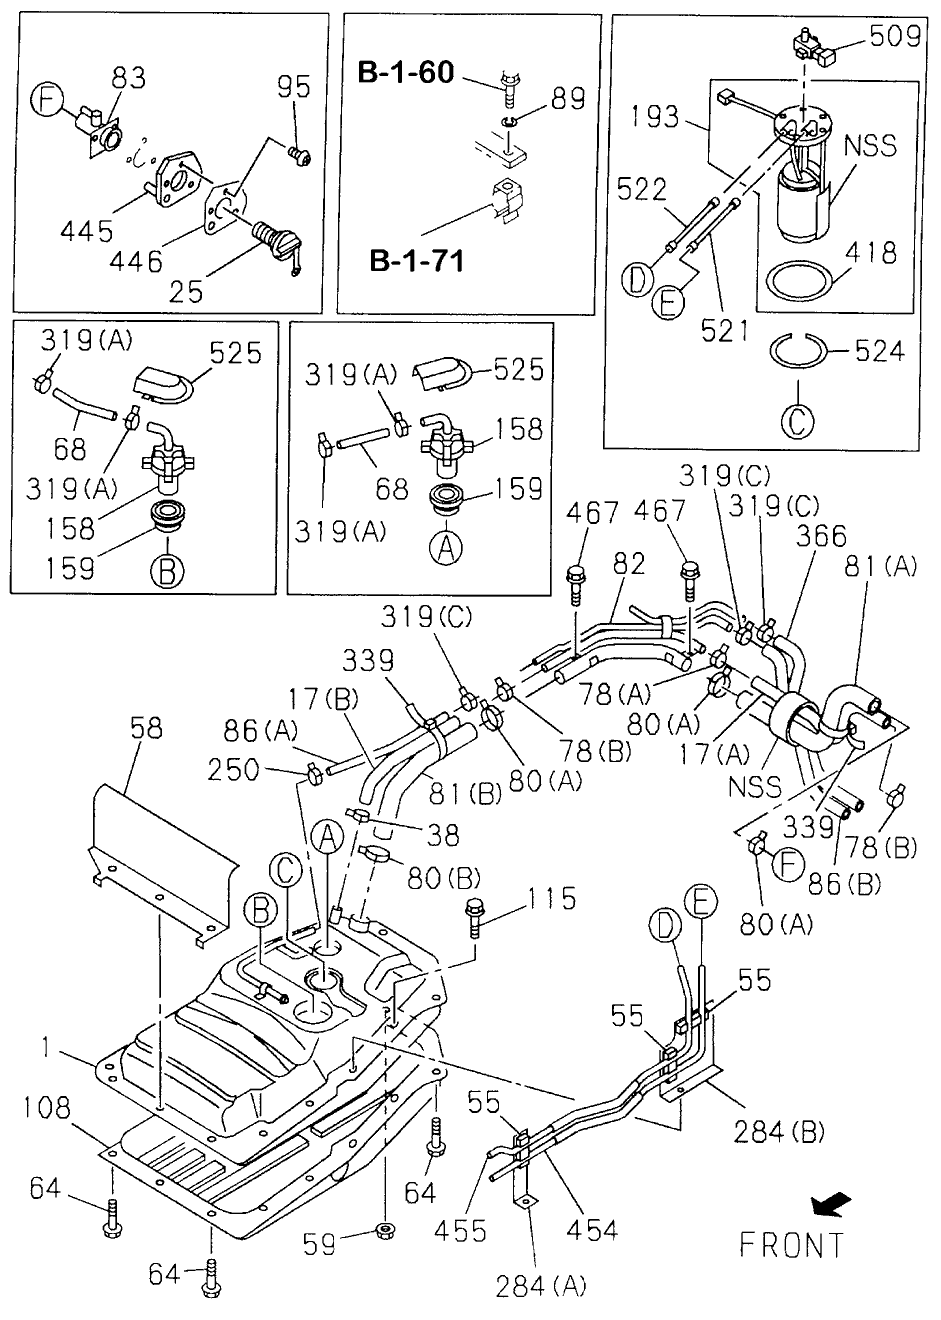 2001 Honda Passport Engine Diagram - Wiring Diagram Models bell-veteran -  bell-veteran.zeevaproduction.it | Wiring Diagram For 2000 Honda Passport |  | bell-veteran.zeevaproduction.it